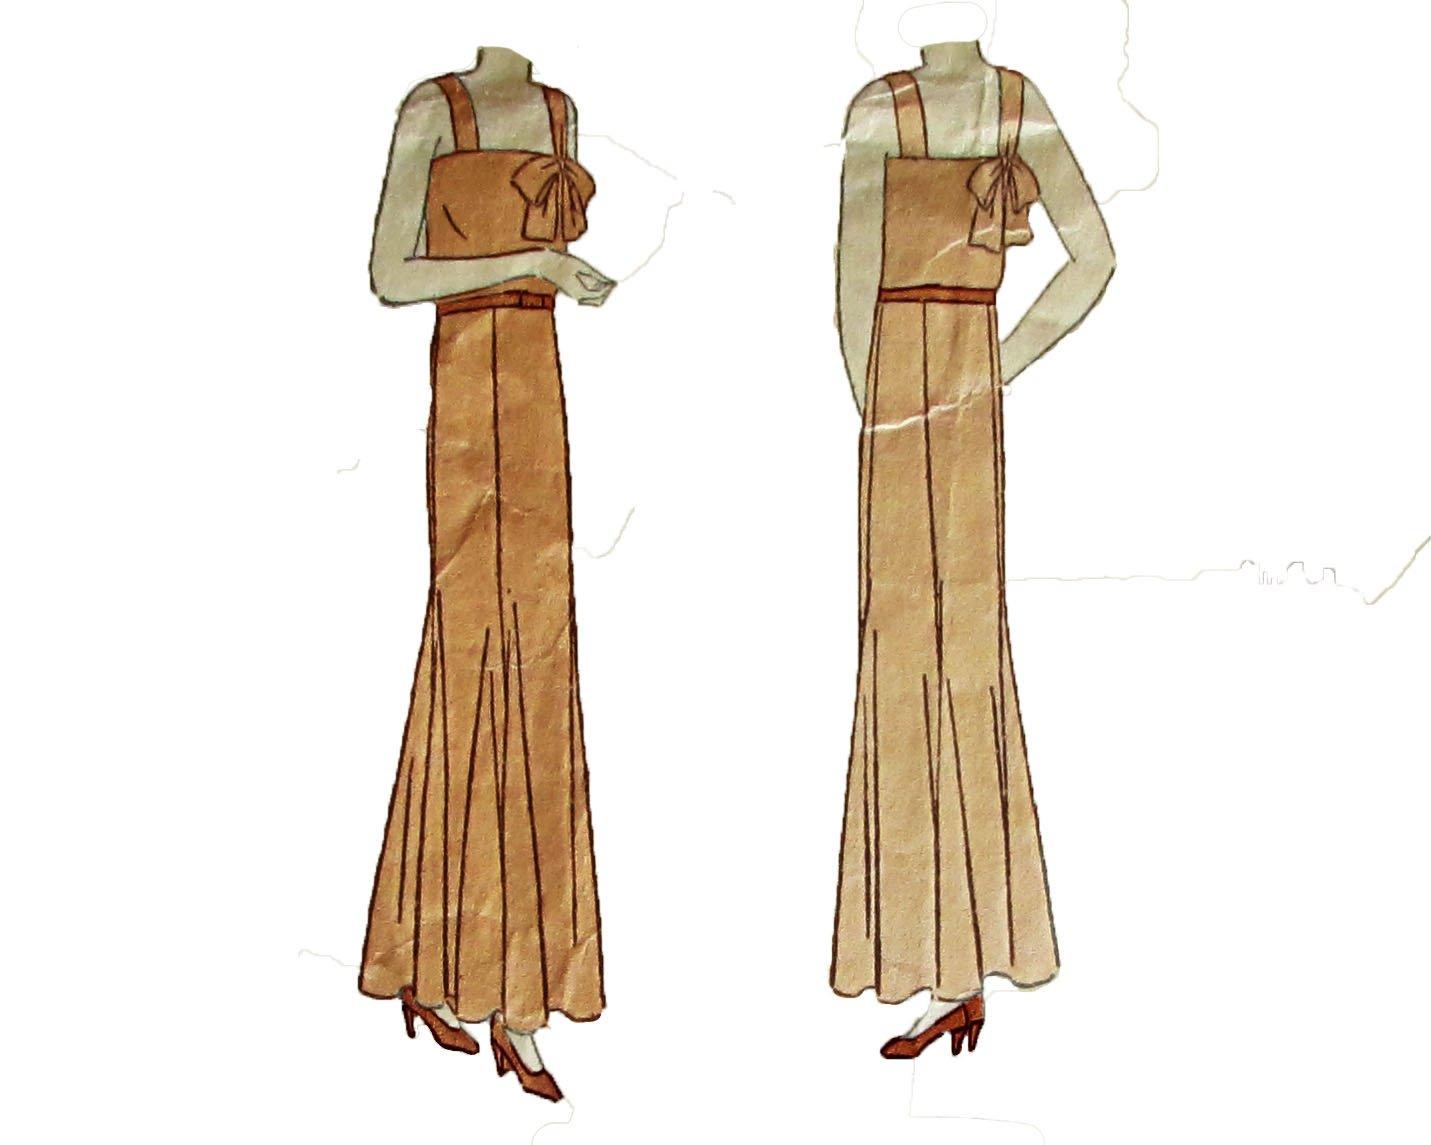 Vogue Pattern 5208 One Piece Sleeveless Evening Frock Vintage 1930 Bust 32 Hip 35